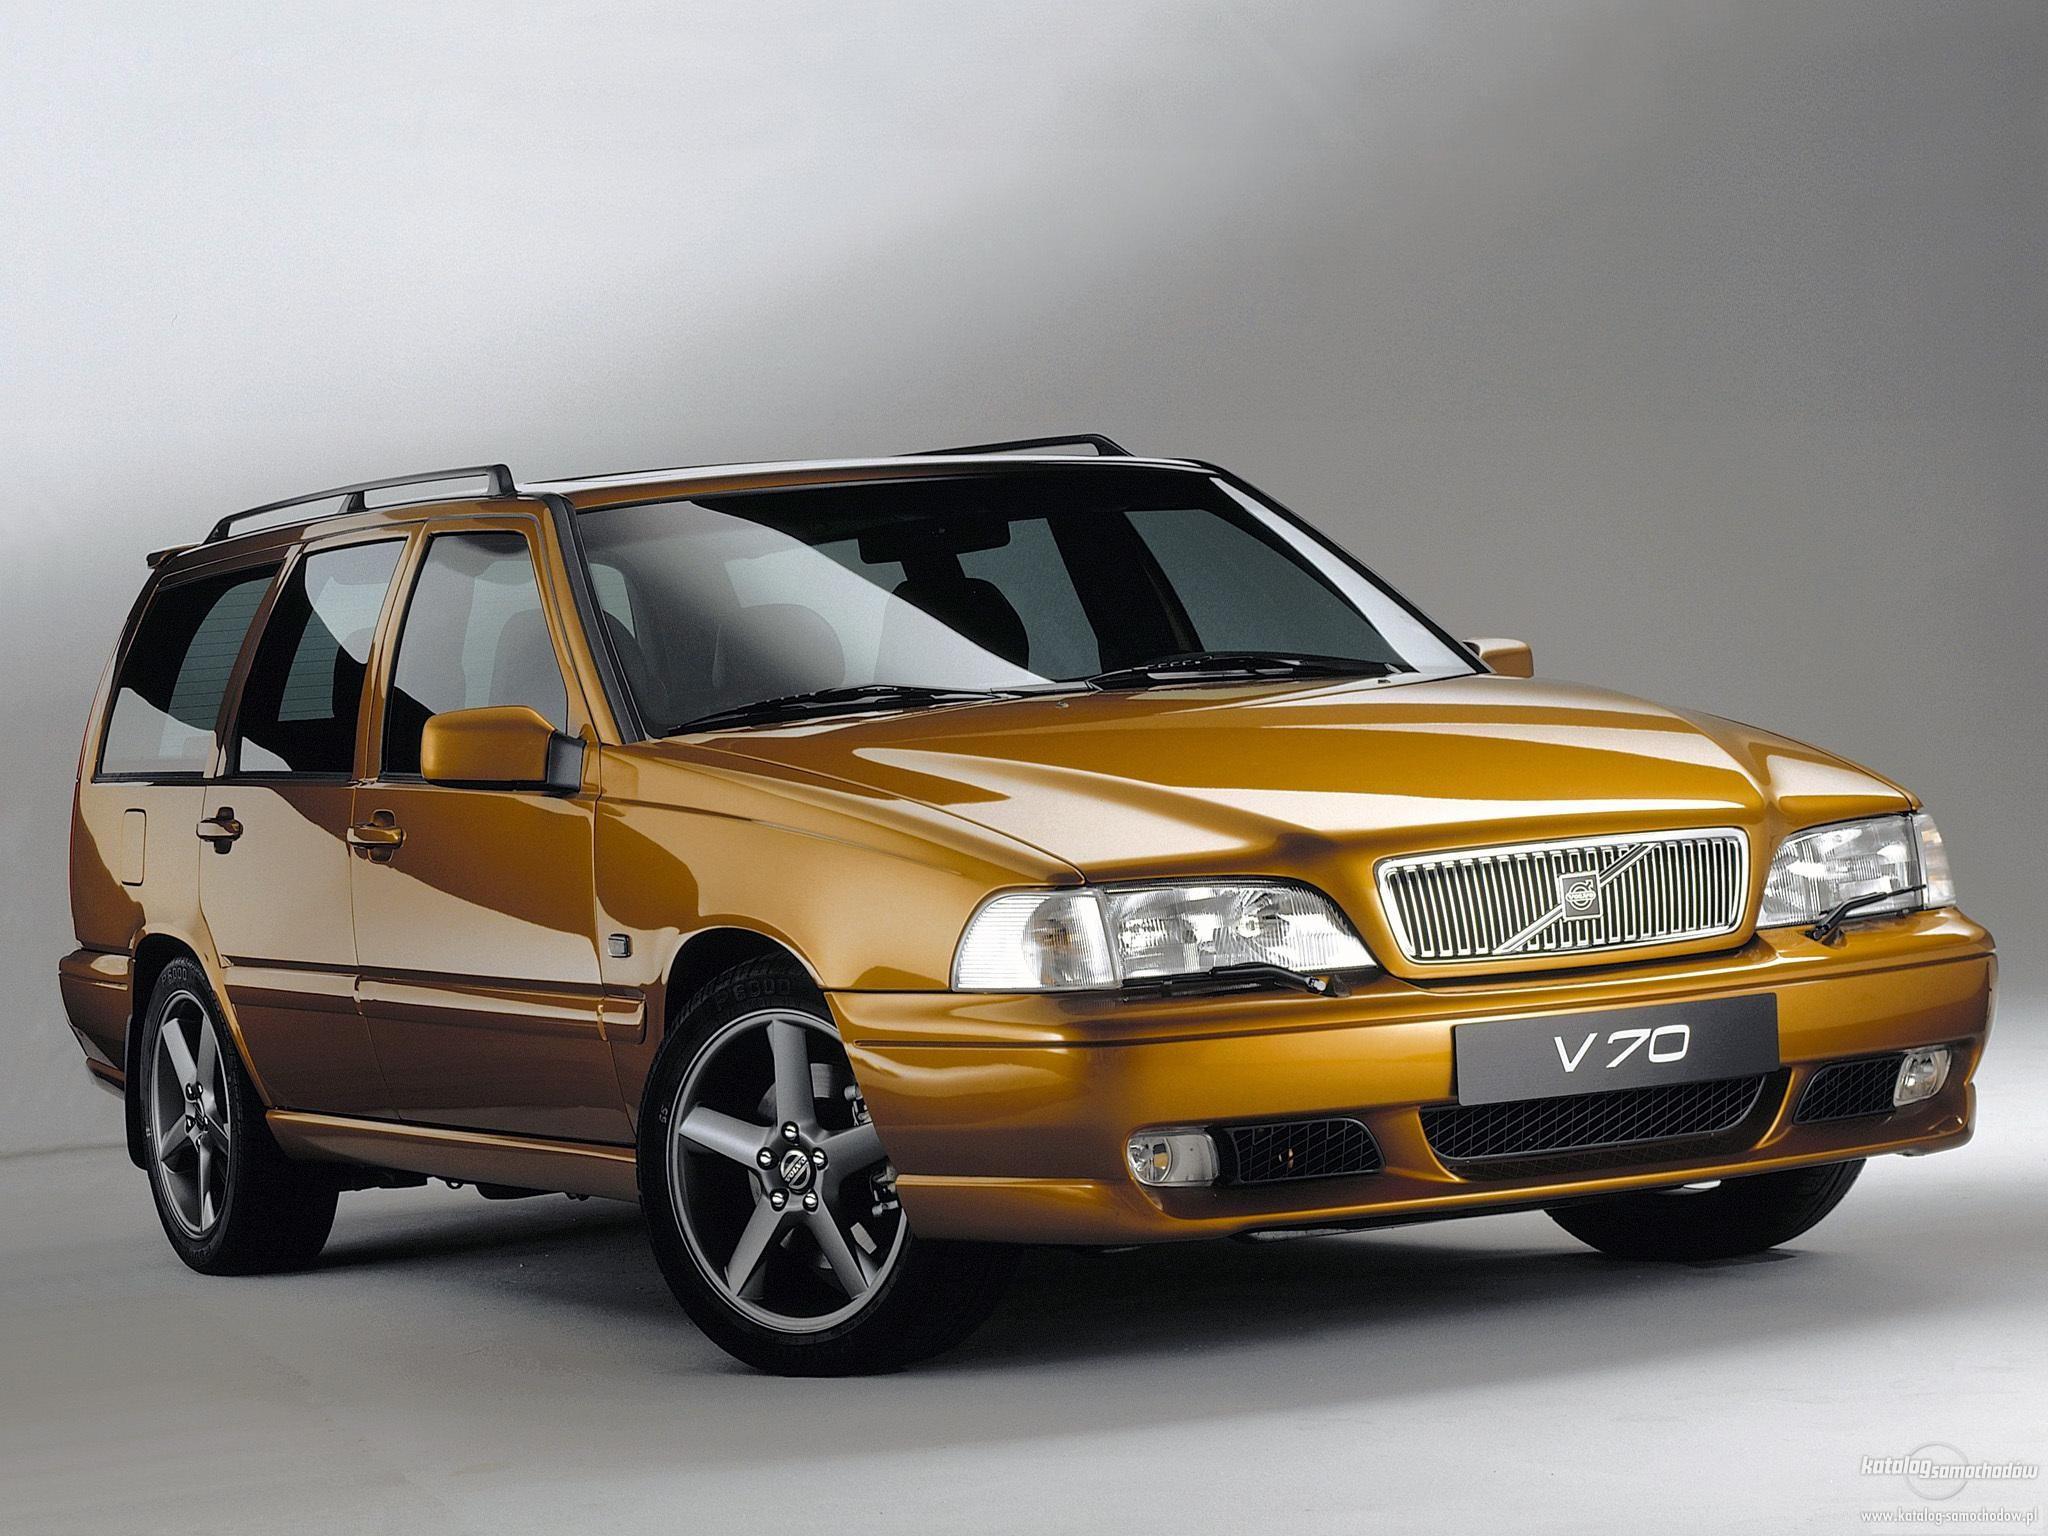 volvo v70 car technical data car specifications vehicle. Black Bedroom Furniture Sets. Home Design Ideas